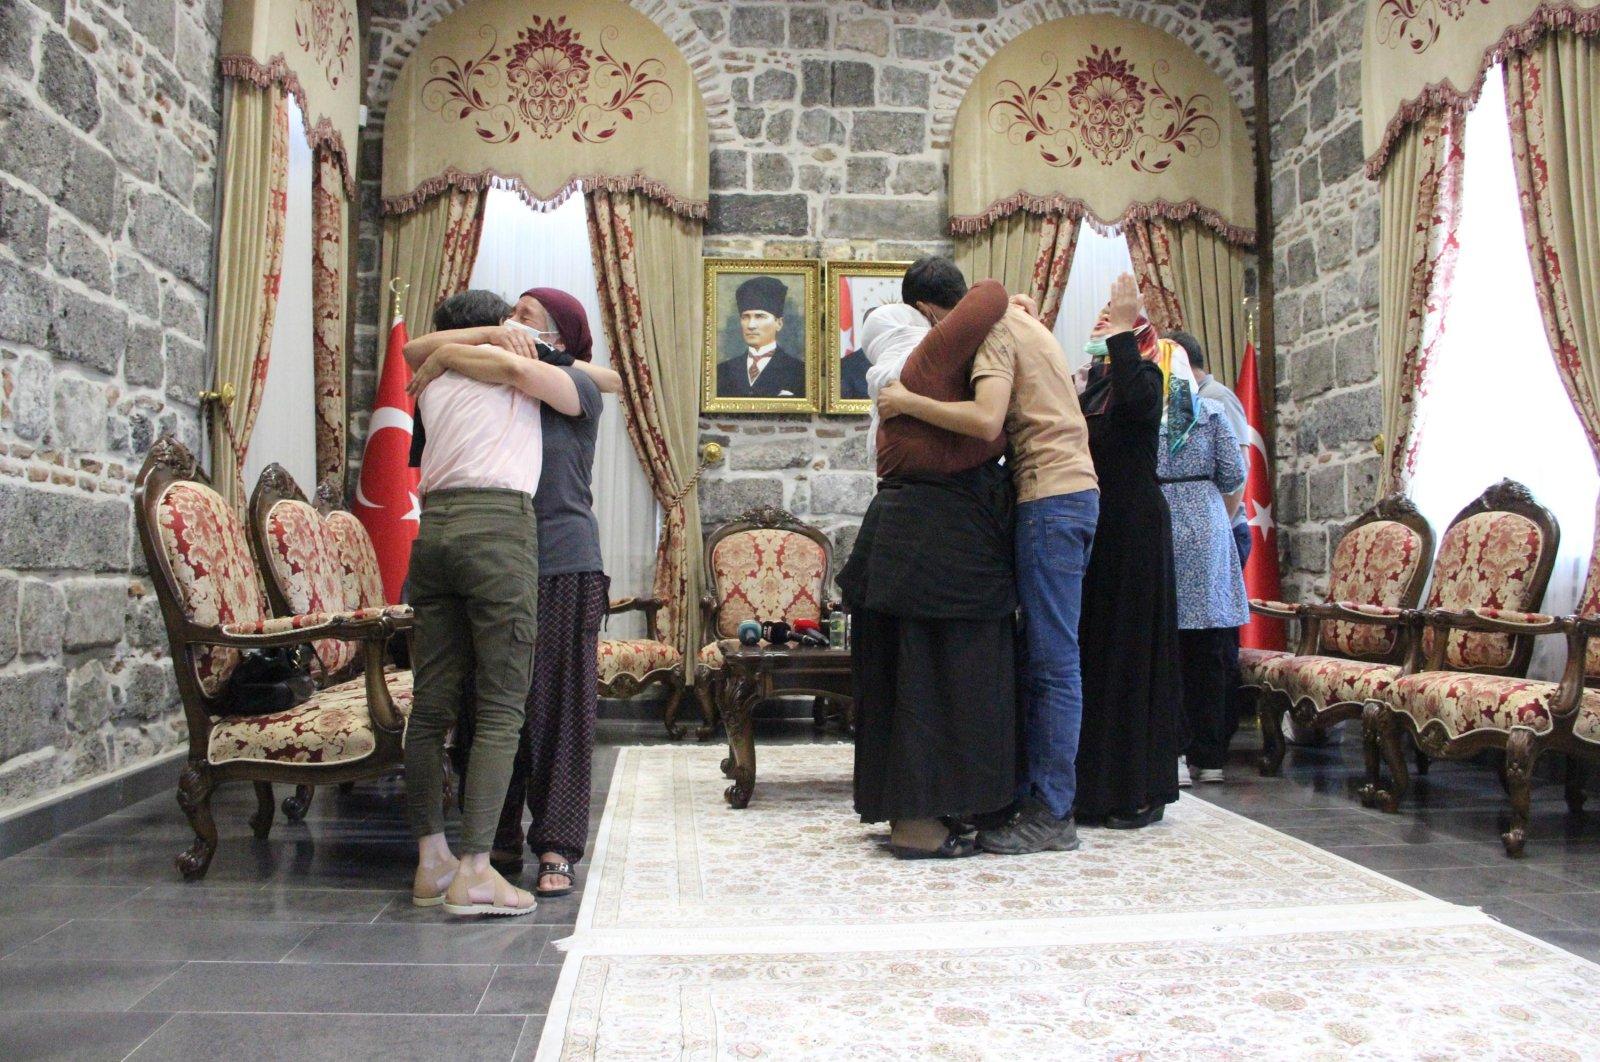 Families of former PKK terrorists Mustafa Biçer, EnsariKaraşanandAlevTuran reunite with their children in Diyarbakir, Turkey, July 29, 2021. (DHA Photo)